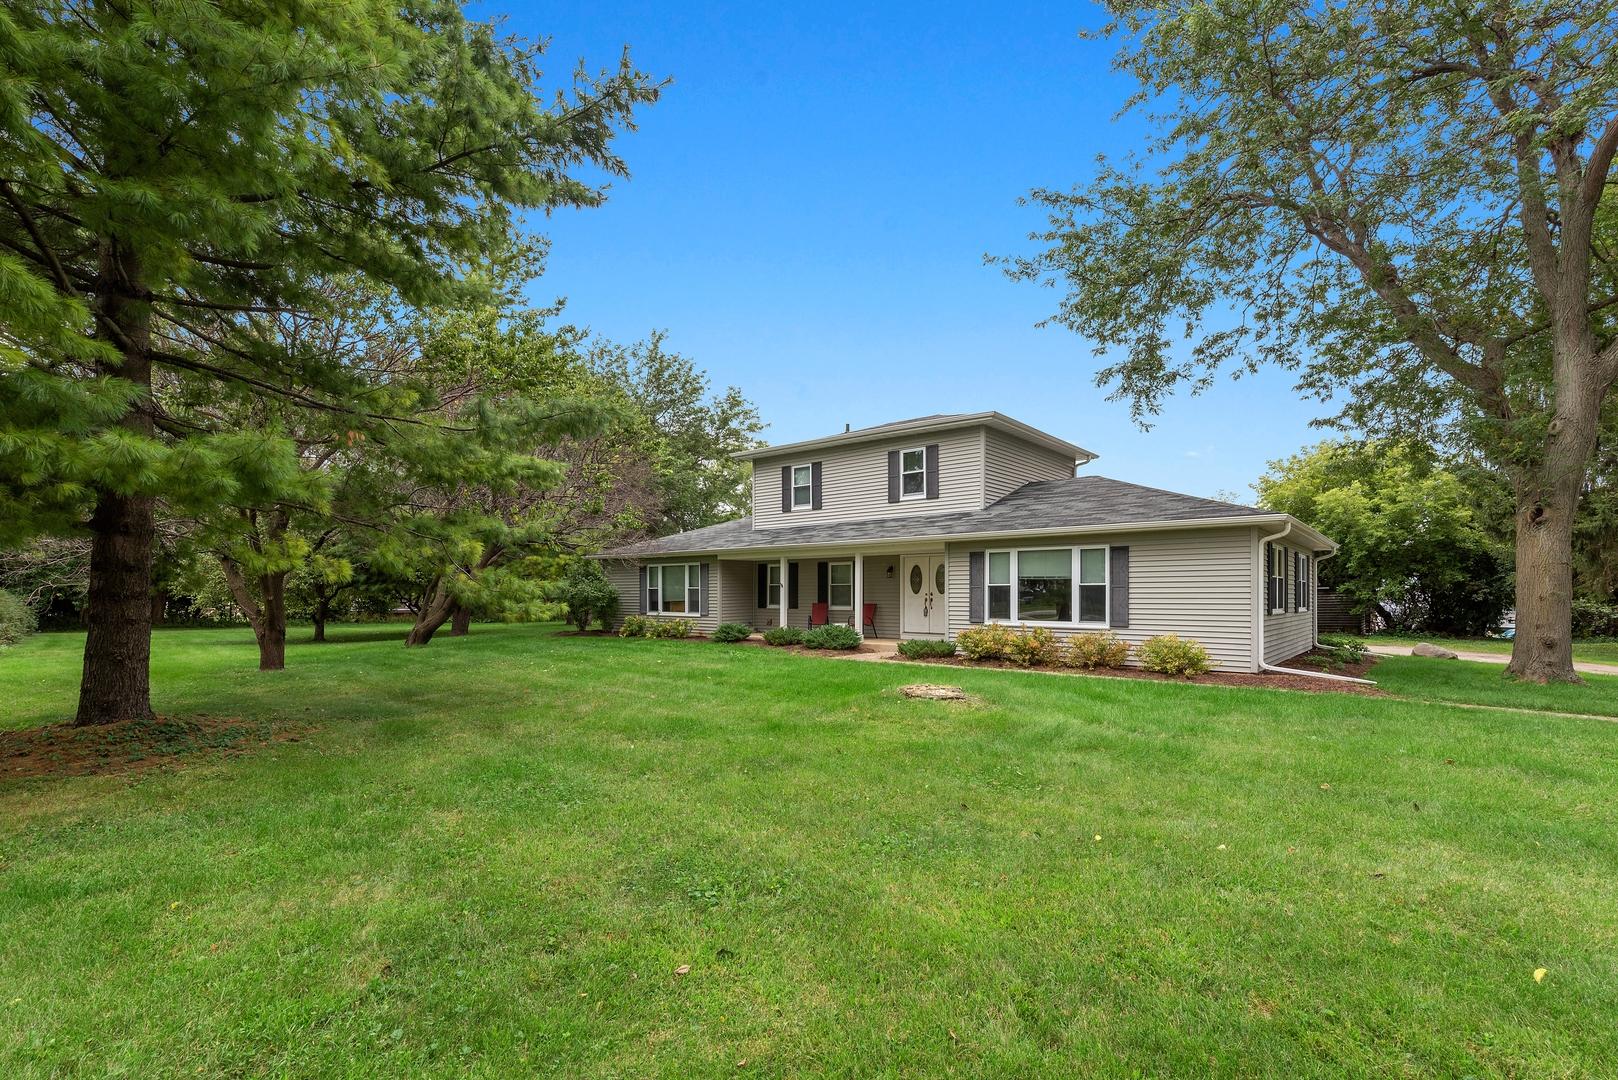 8916 Swanson Road, Crystal Lake IL 60014